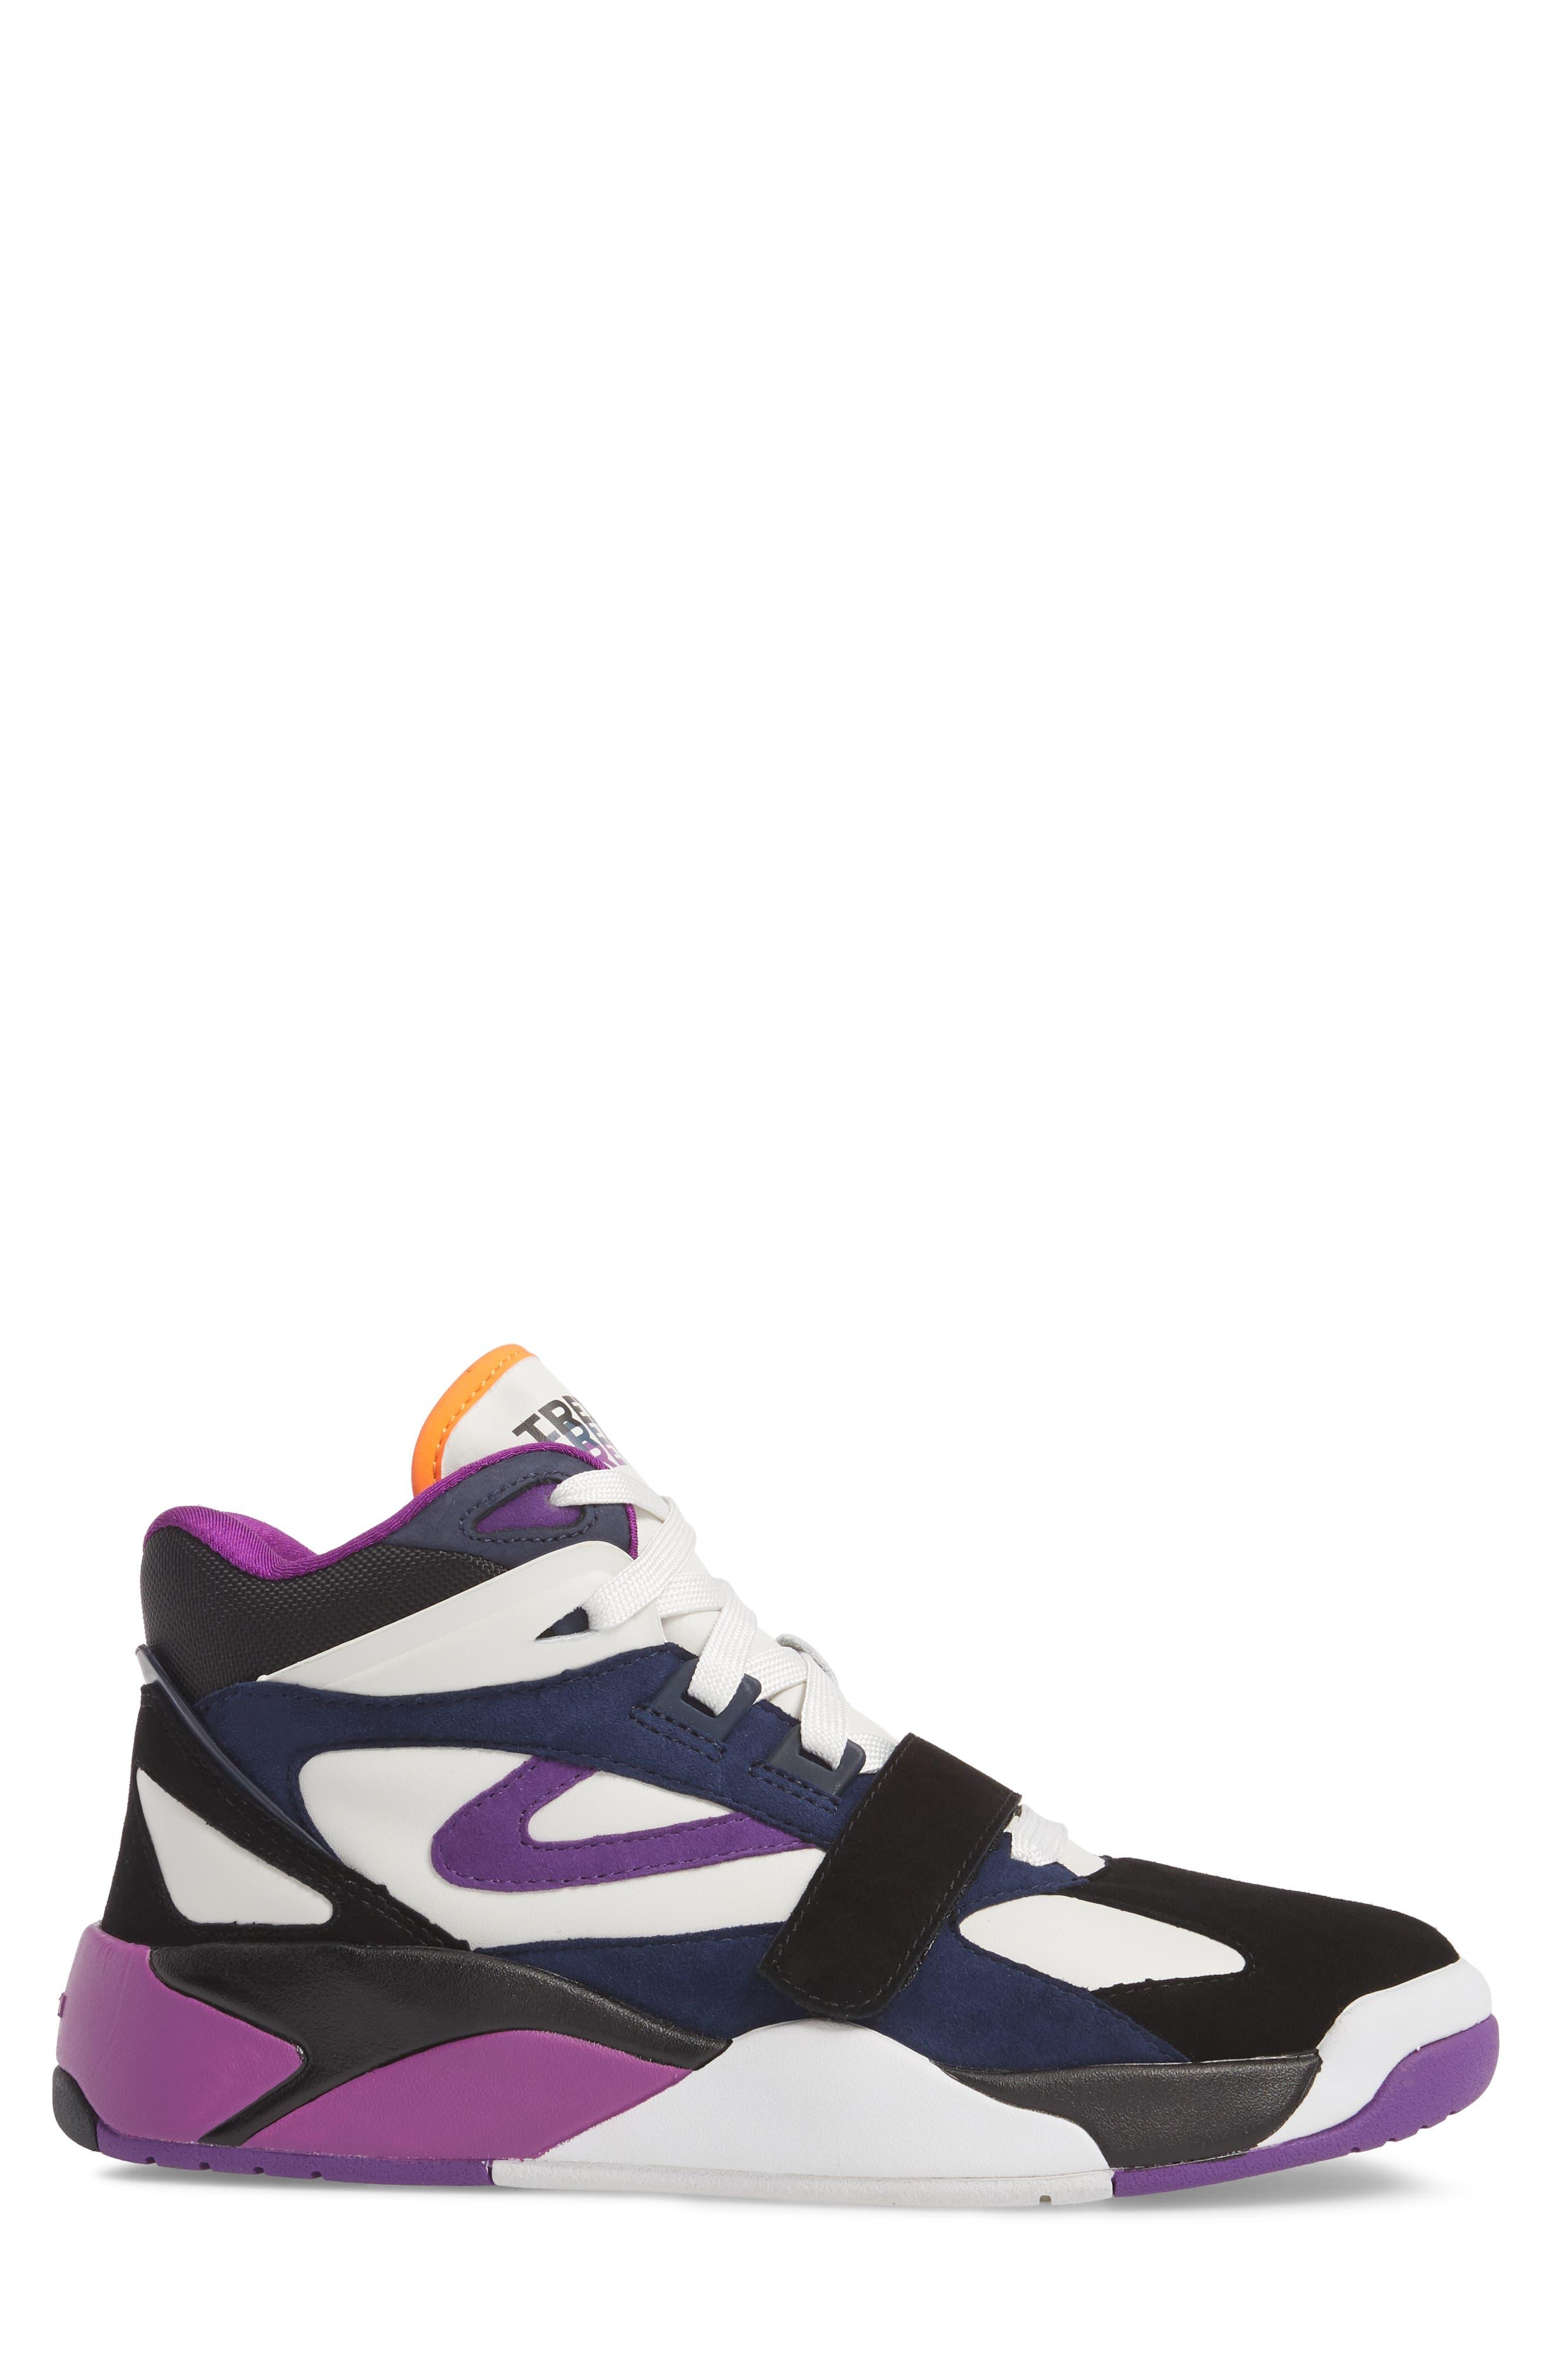 Andre 3000 Bostad 2 High Top Sneaker,                             Alternate thumbnail 3, color,                             Black/ White/ Purple